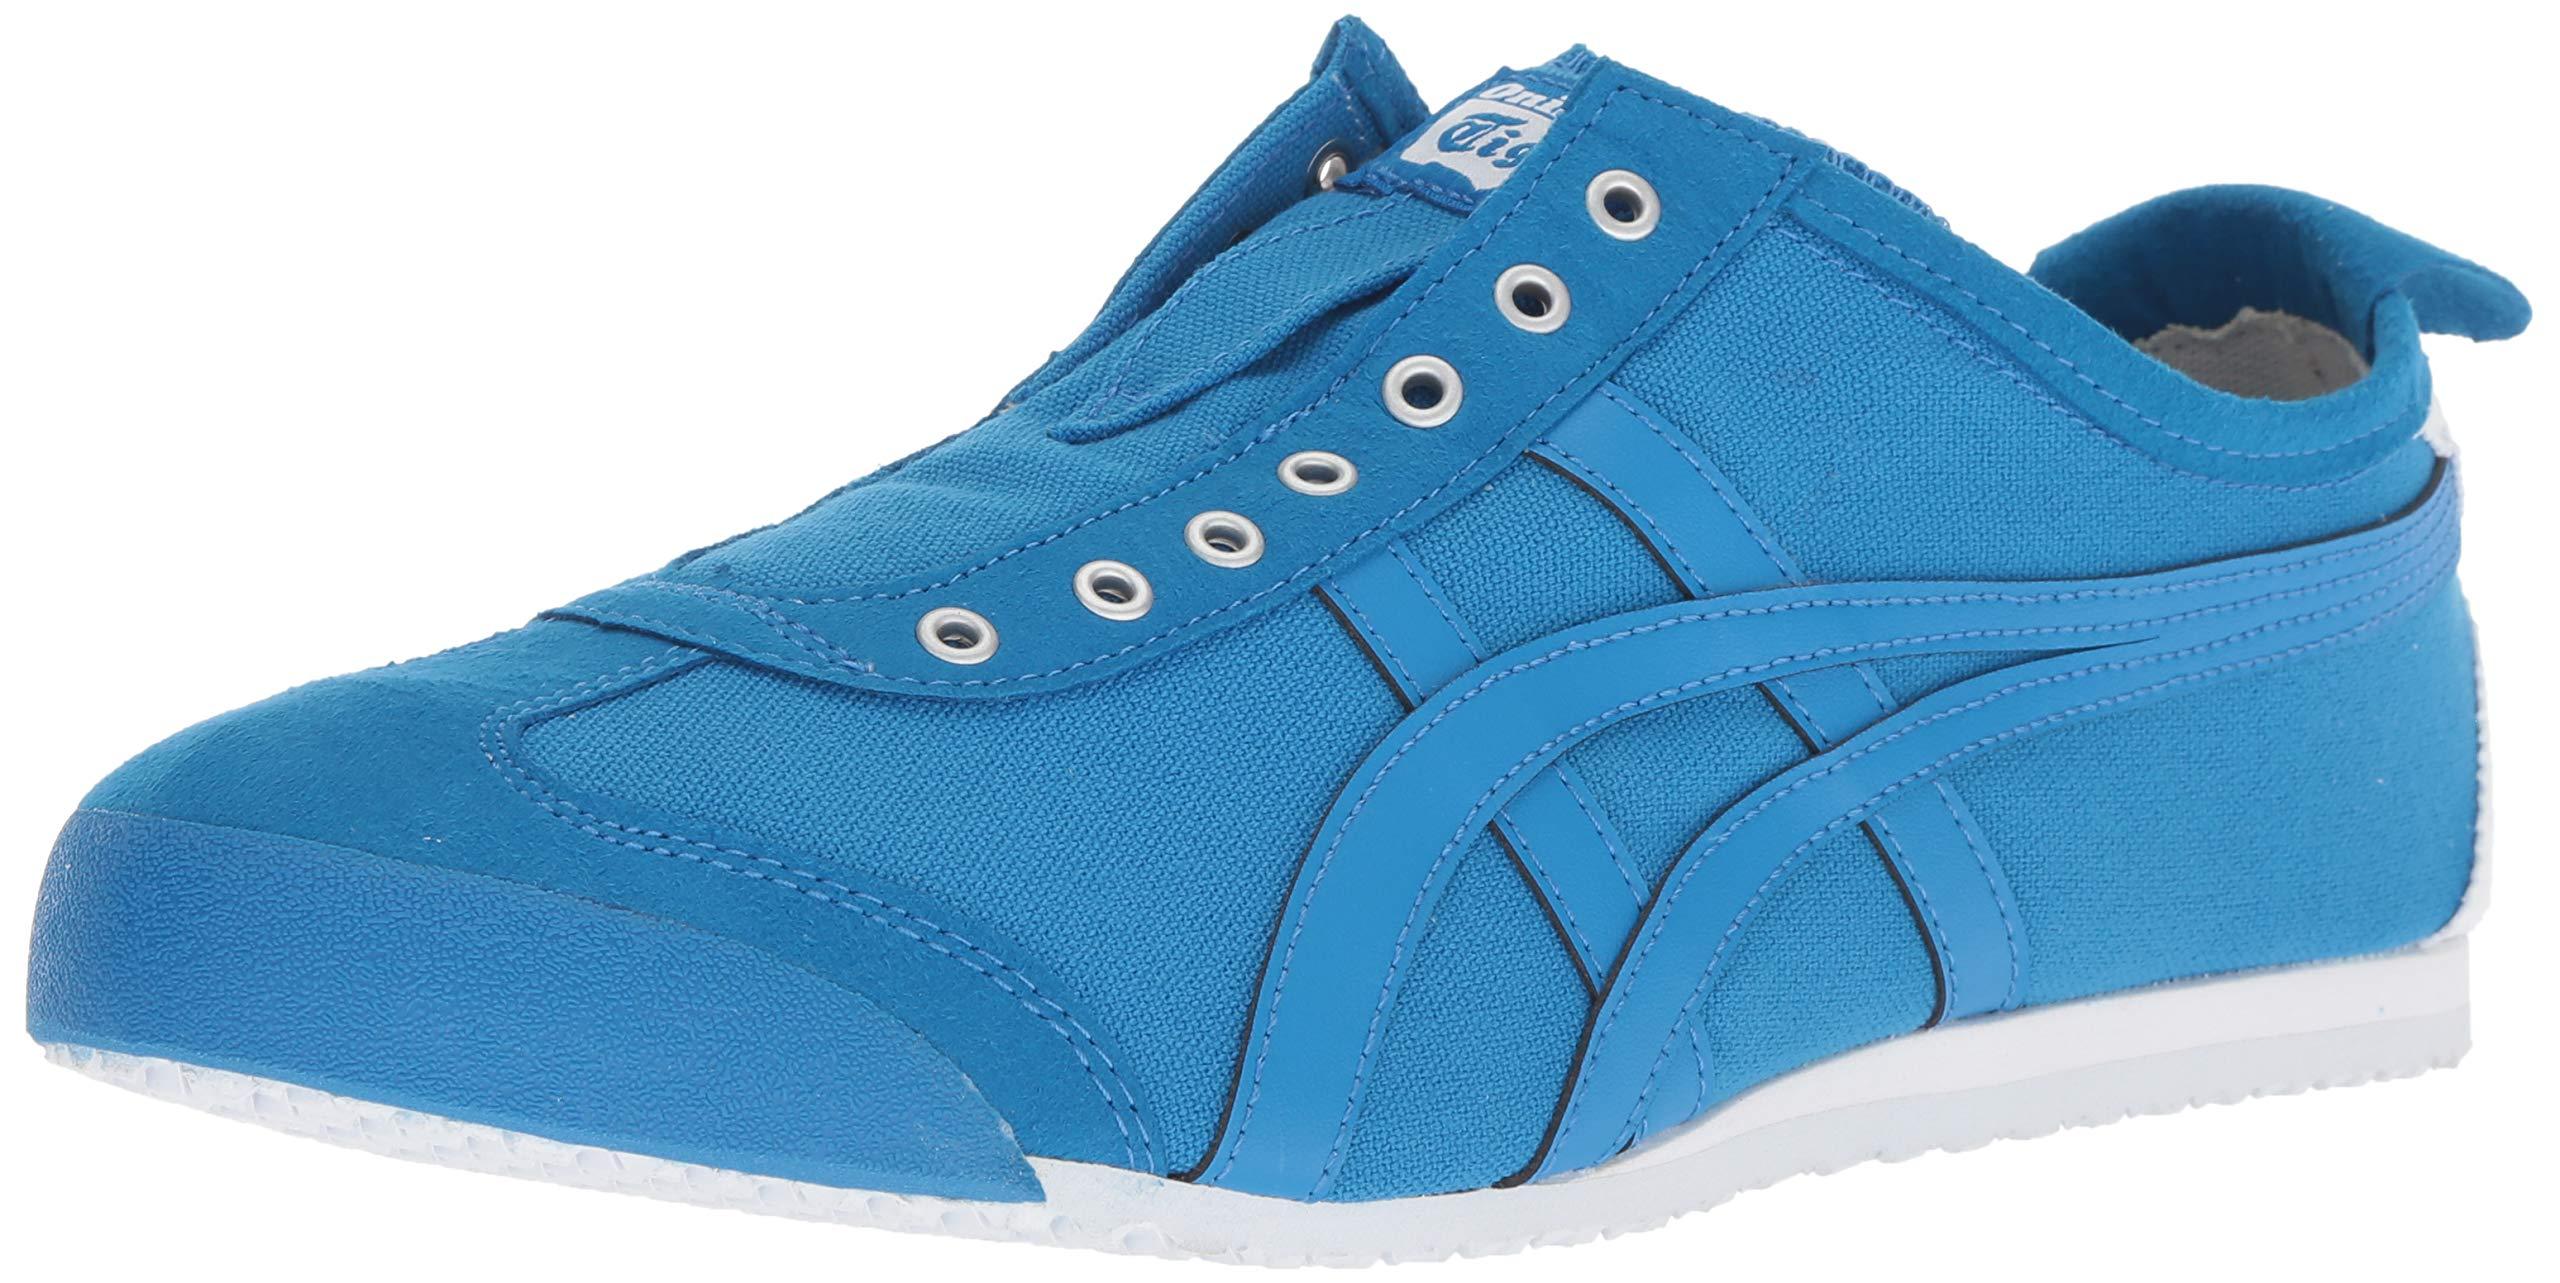 size 40 2b9be 8d80d Onitsuka Tiger Unisex Mexico 66 Slip-on Shoes D3K0N, Directoire  Blue/Directoire Blue, 4 M US